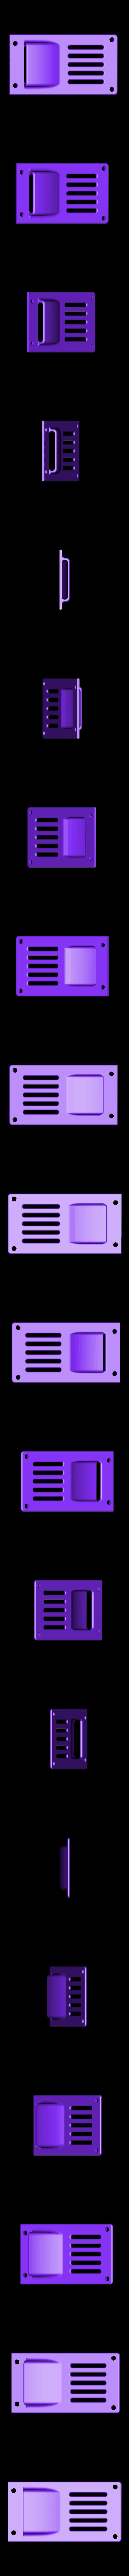 Rear_Cover_v3_final.stl Descargar archivo STL Ritewing Nano Drak Print Bundle • Objeto imprimible en 3D, RobsLoco